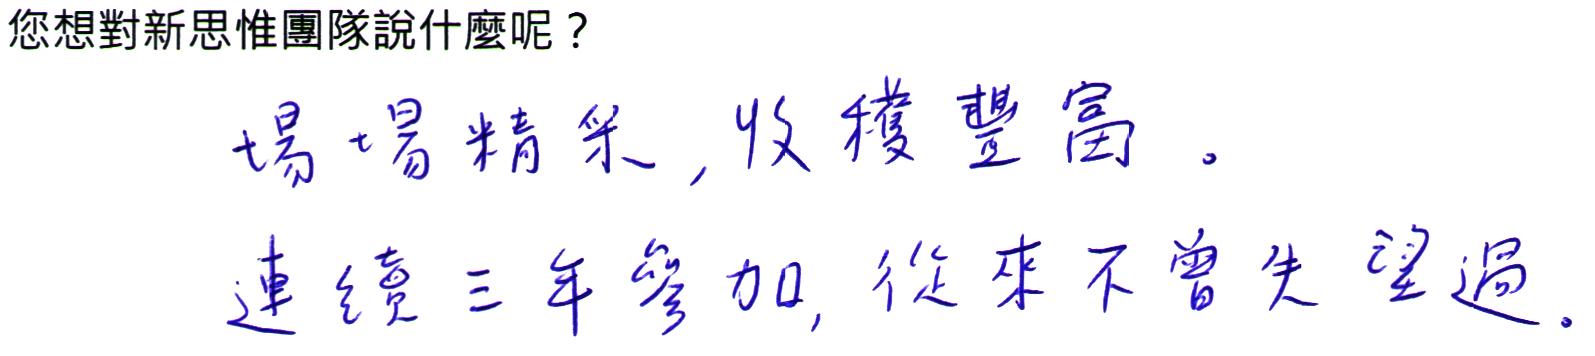 20170924_YMRF_feedback_00049